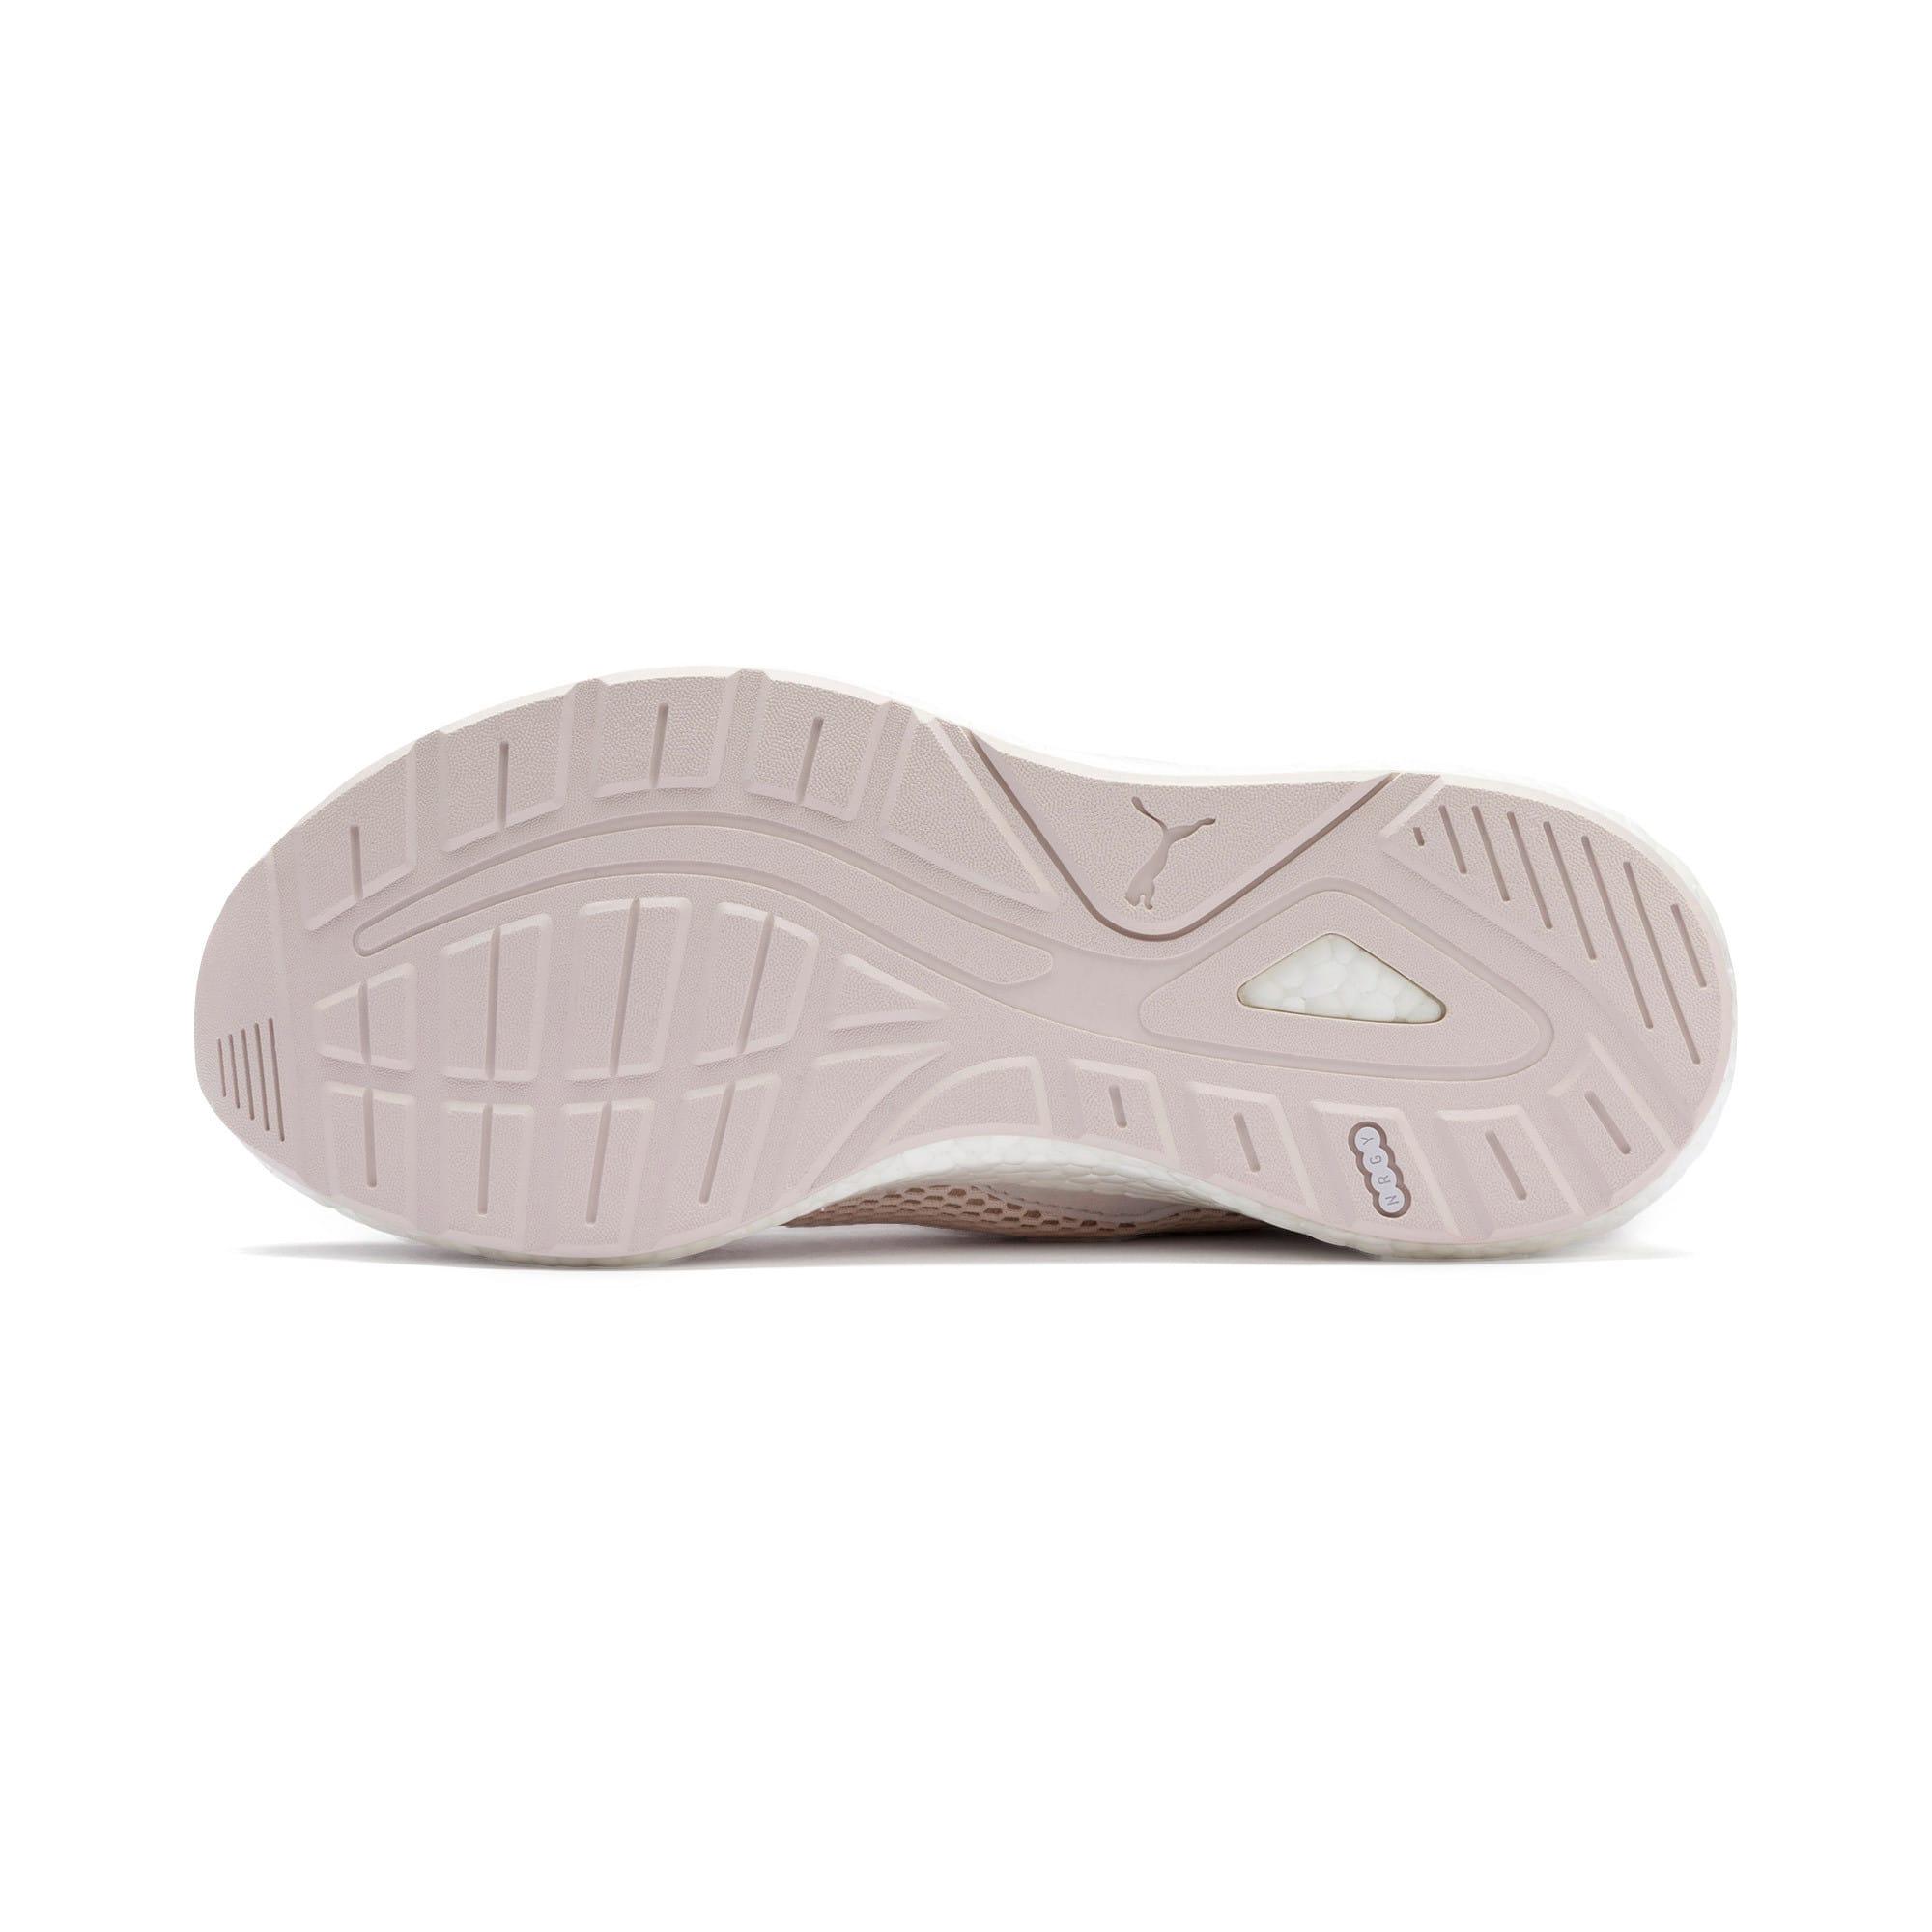 Thumbnail 5 of NRGY Neko Skim Women's Running Shoes, Pastel Parchment-Bridal Rose, medium